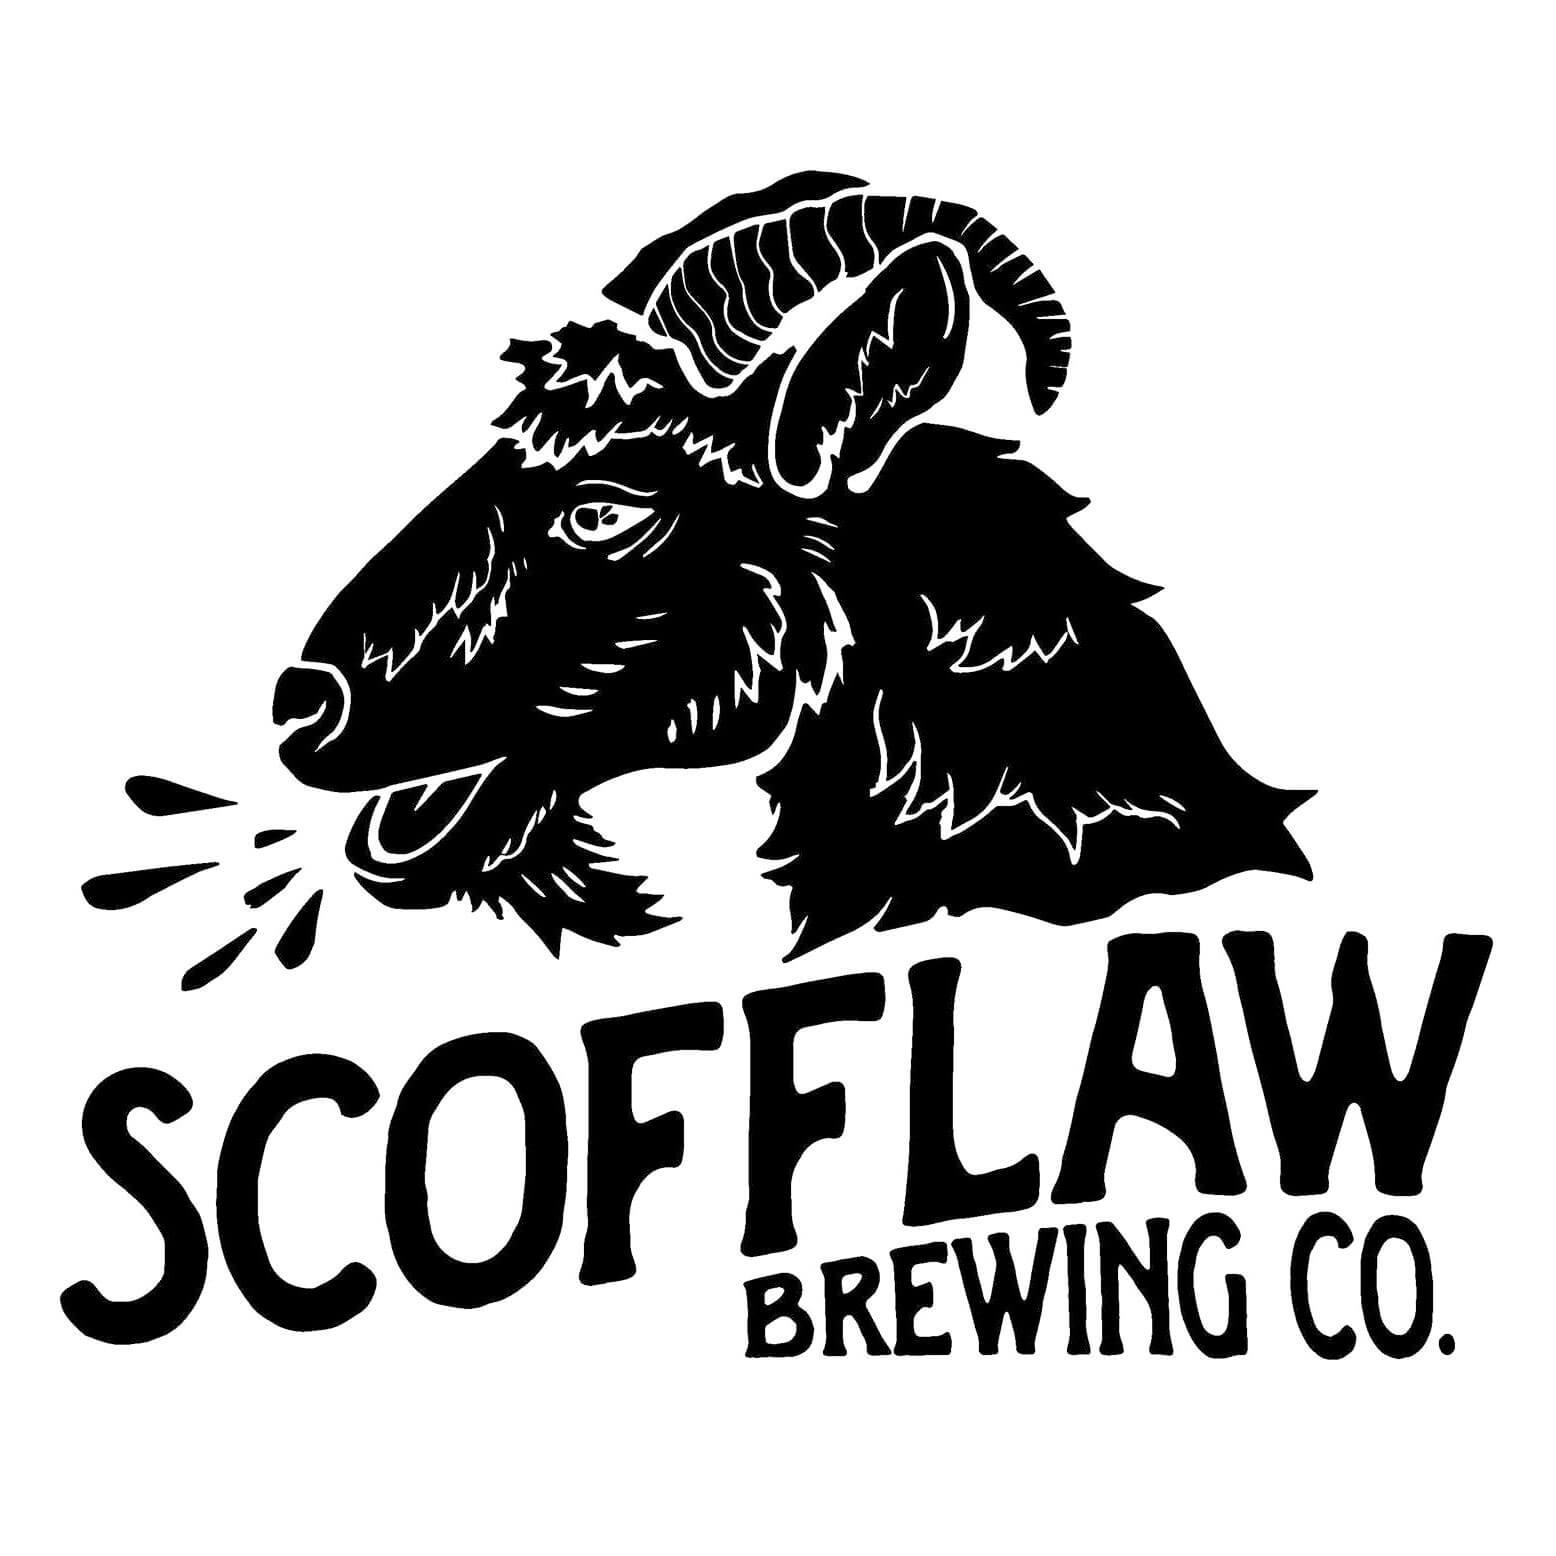 Scofflaw Brewing Co. Logo